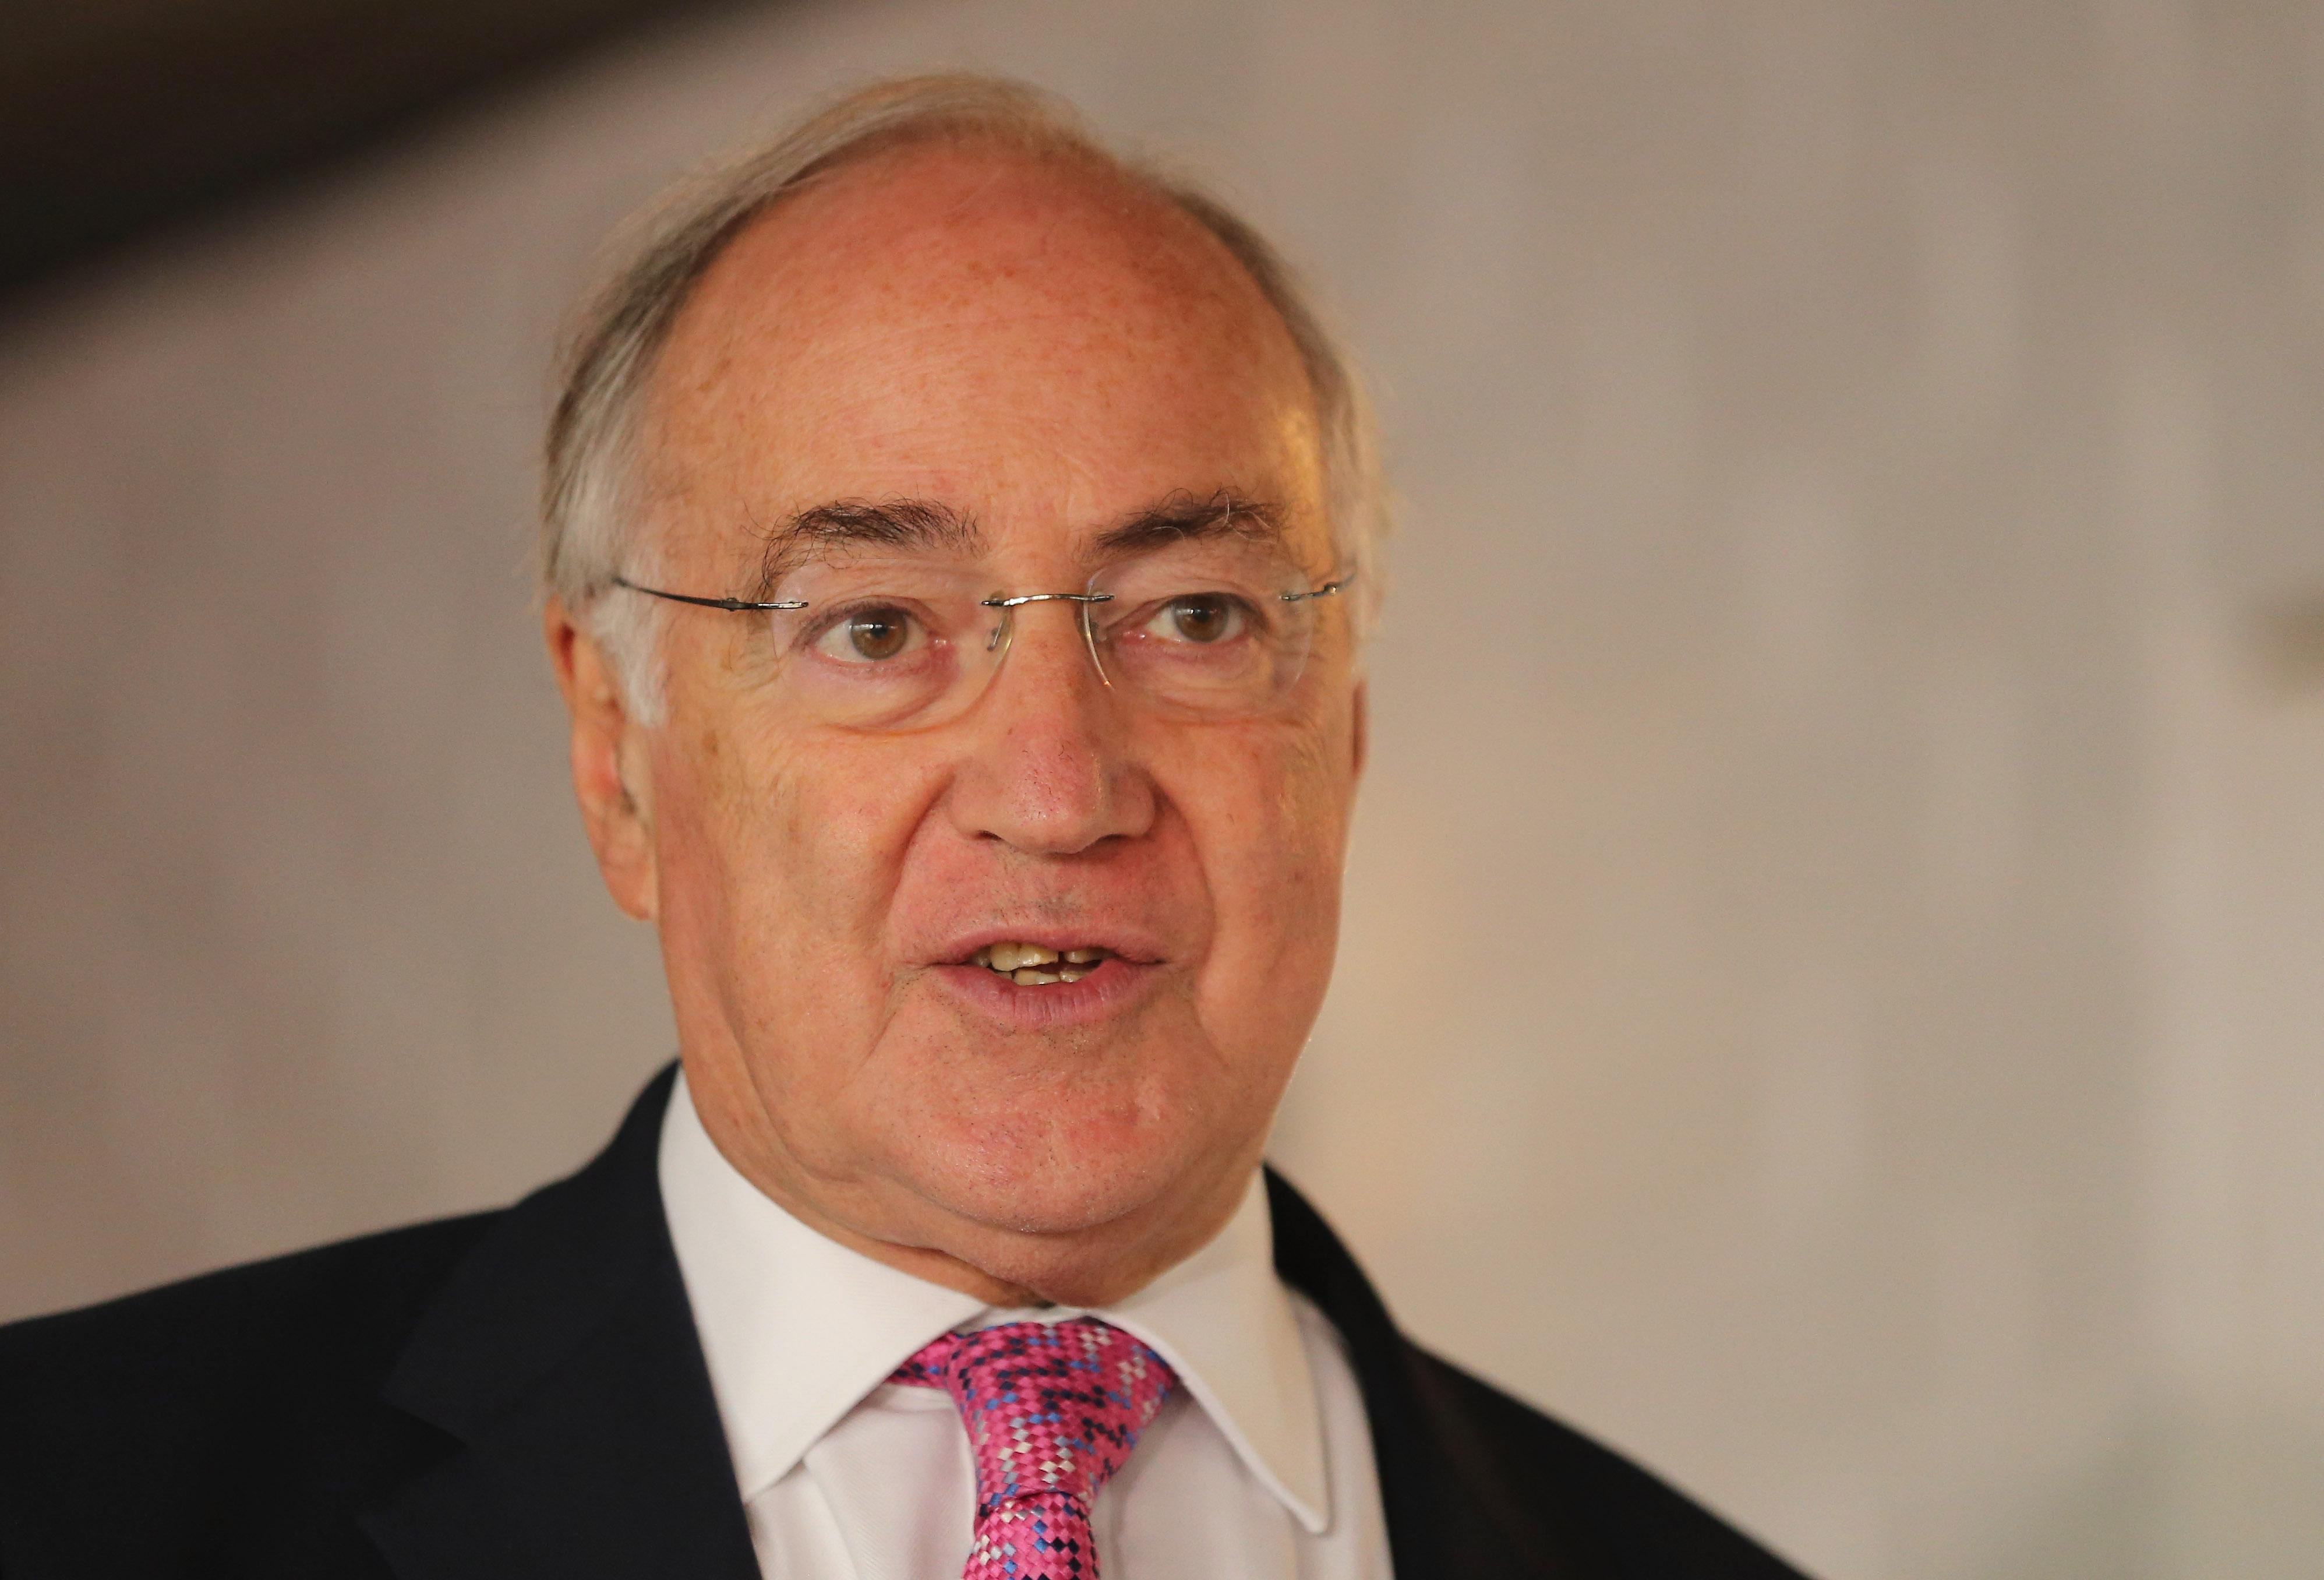 Brexit Internal Markets Bill 'Bad for Britain', Michael Howard Says